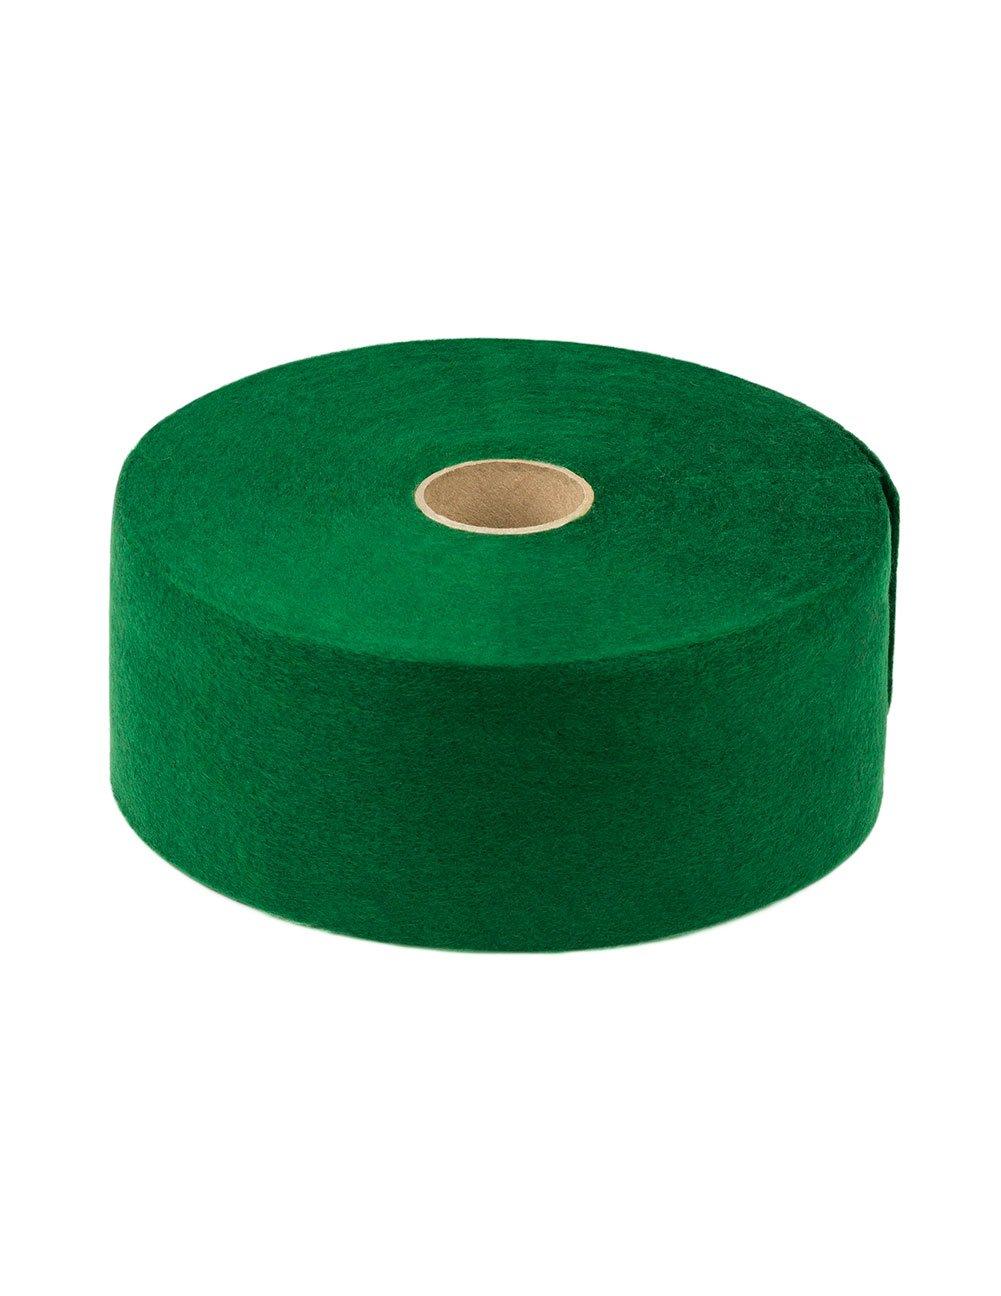 Acrylic Felt Ribbon: 3'' Wide X 50' Long X 1/16'' Thick, Green